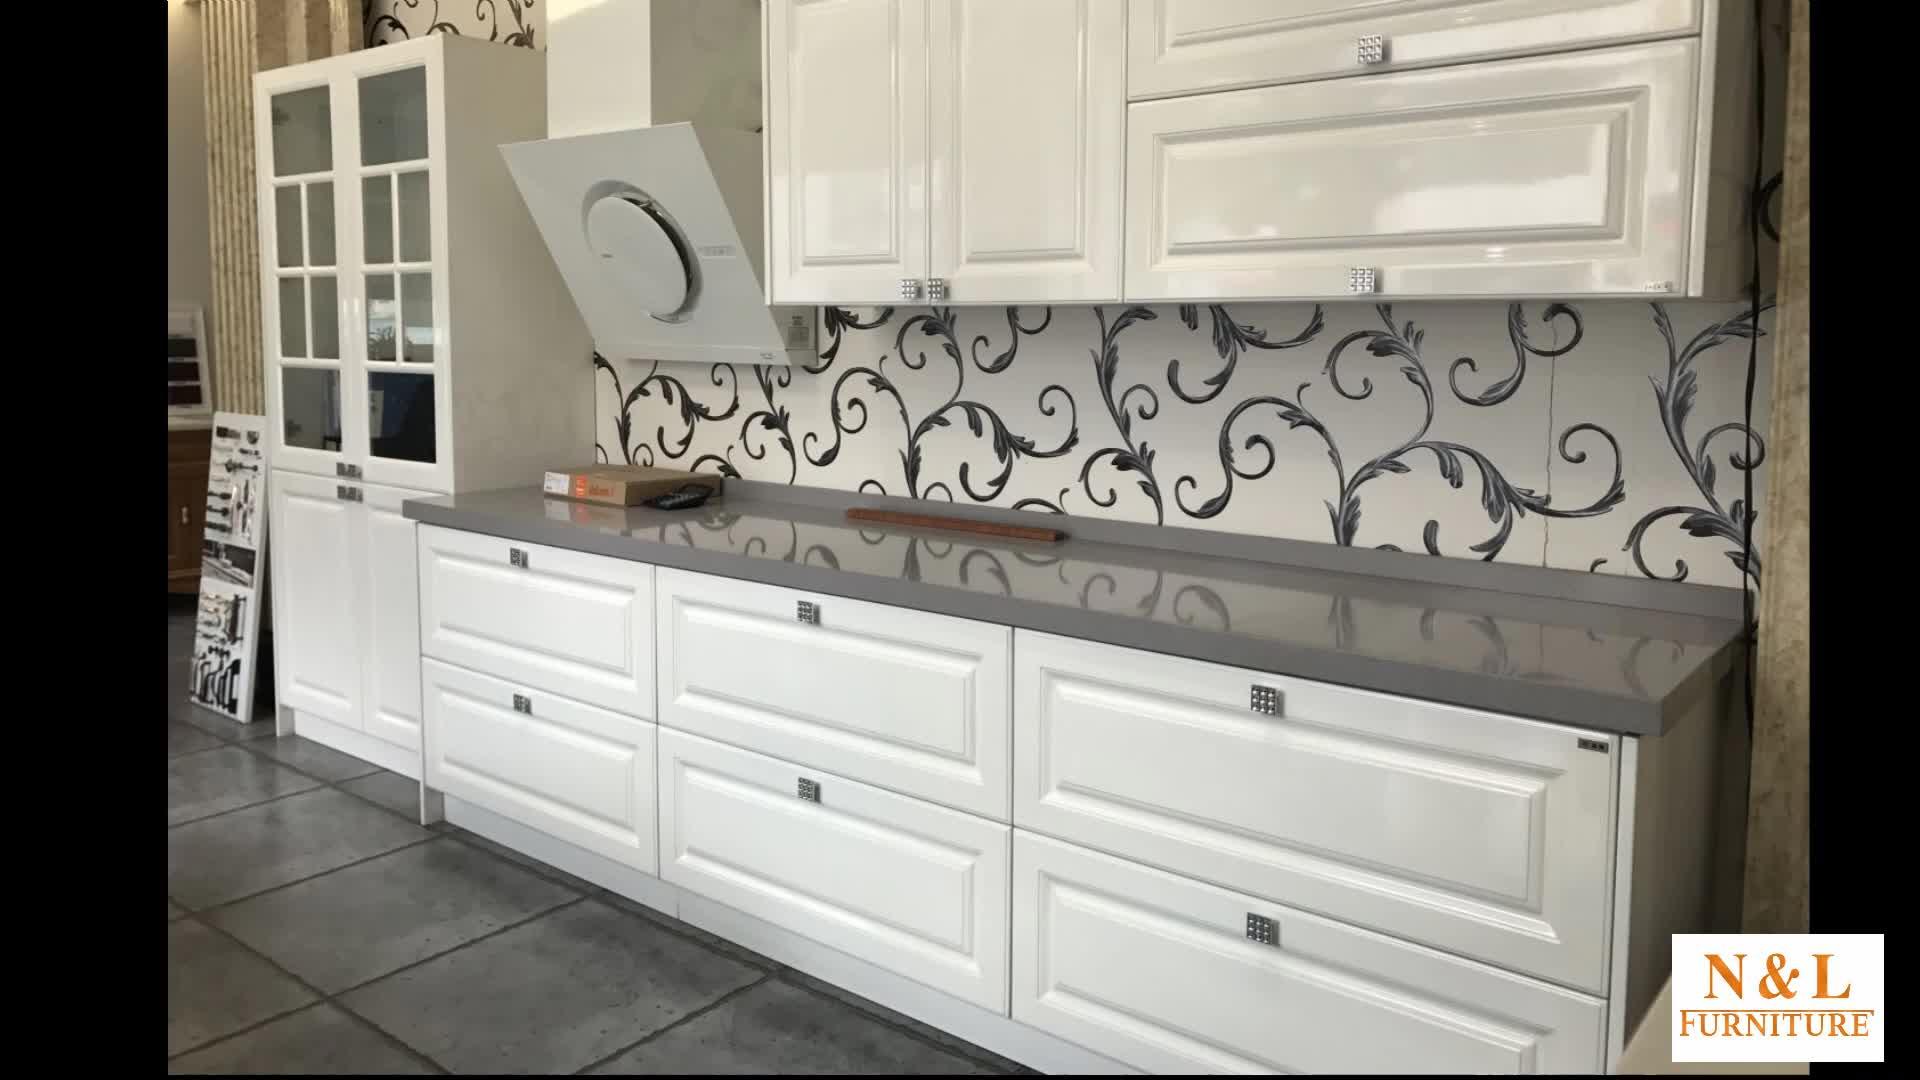 Fiji High Gloss Modern Mdf Lacquer Wood Kitchen Cabinet Furniture ...